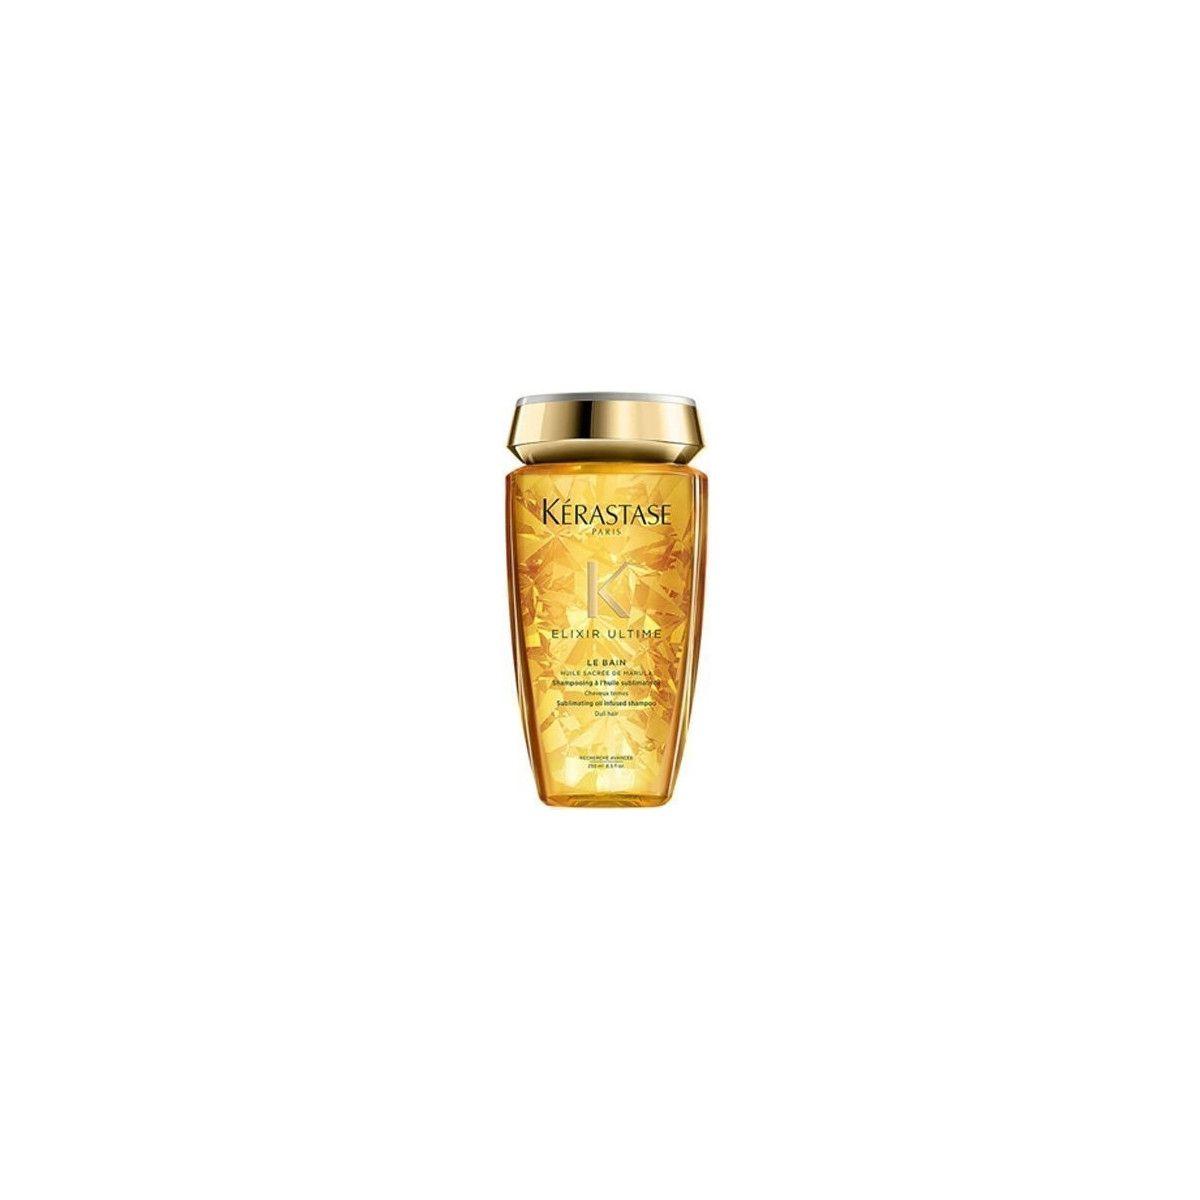 Kerastase Elixir Ultime szampon 250ml